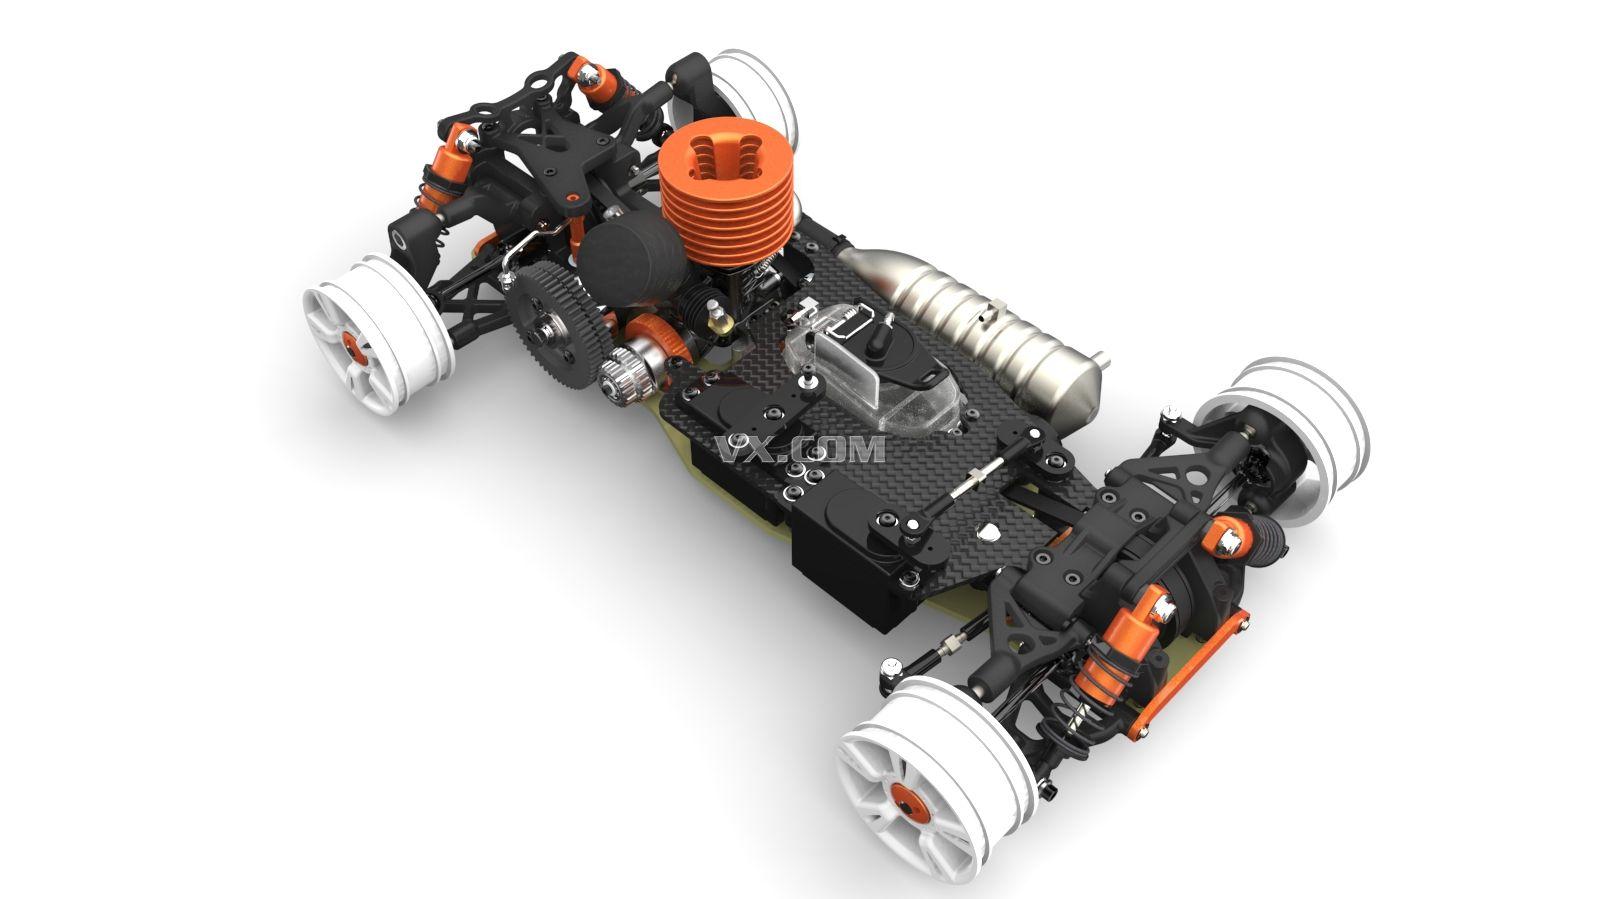 3dmax 赛车底盘结构设计图